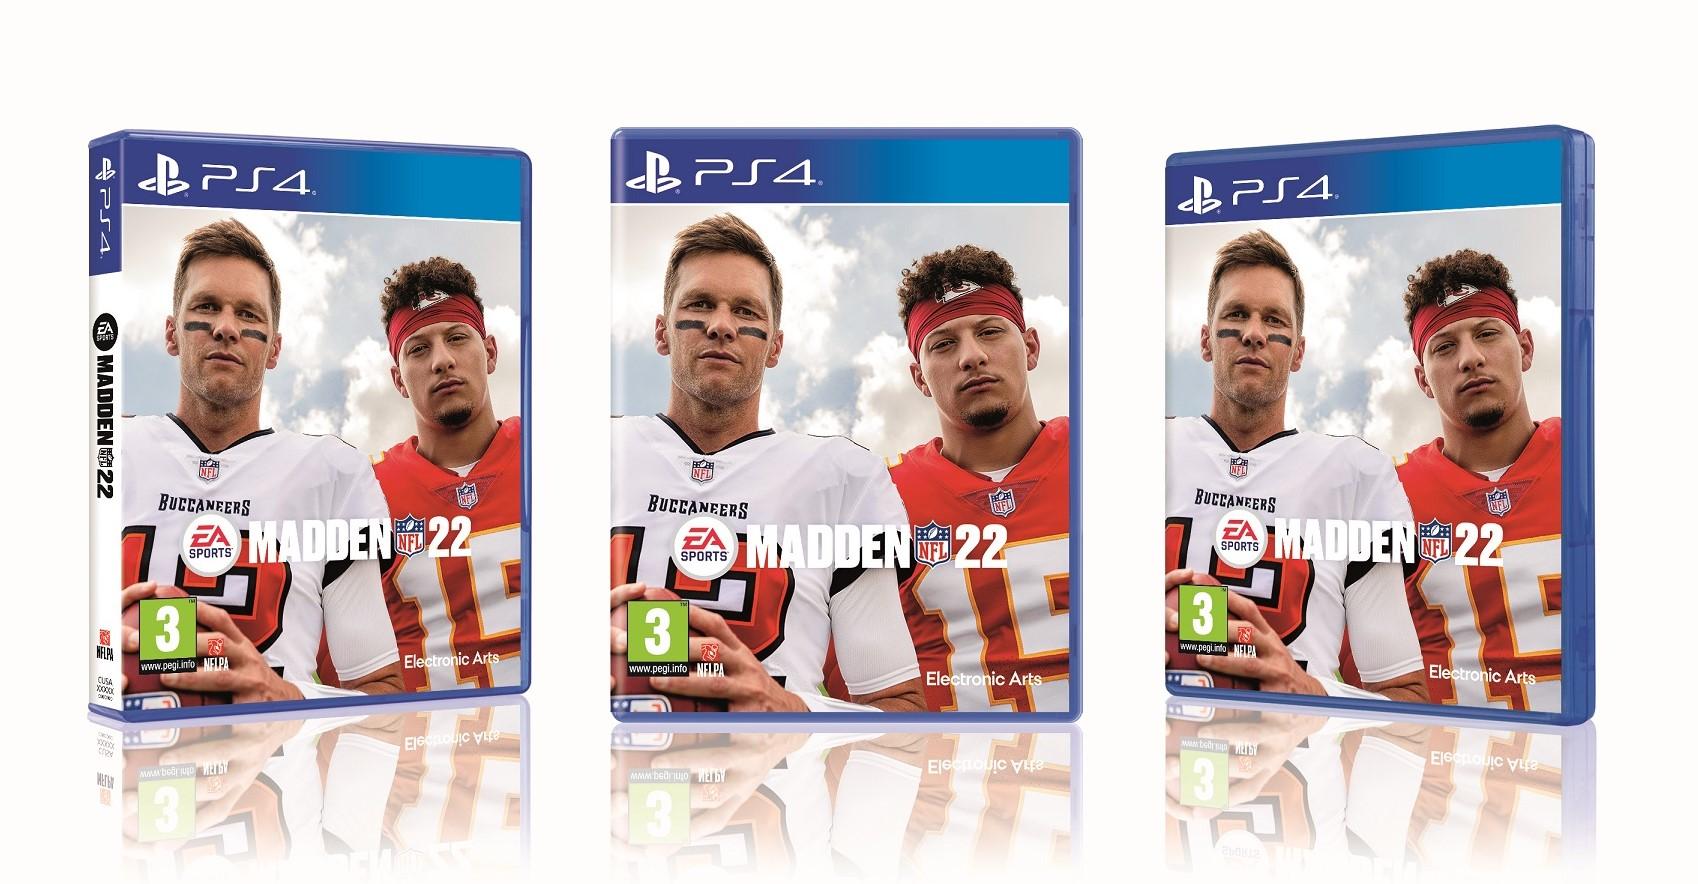 PS4 - Madden NFL 22